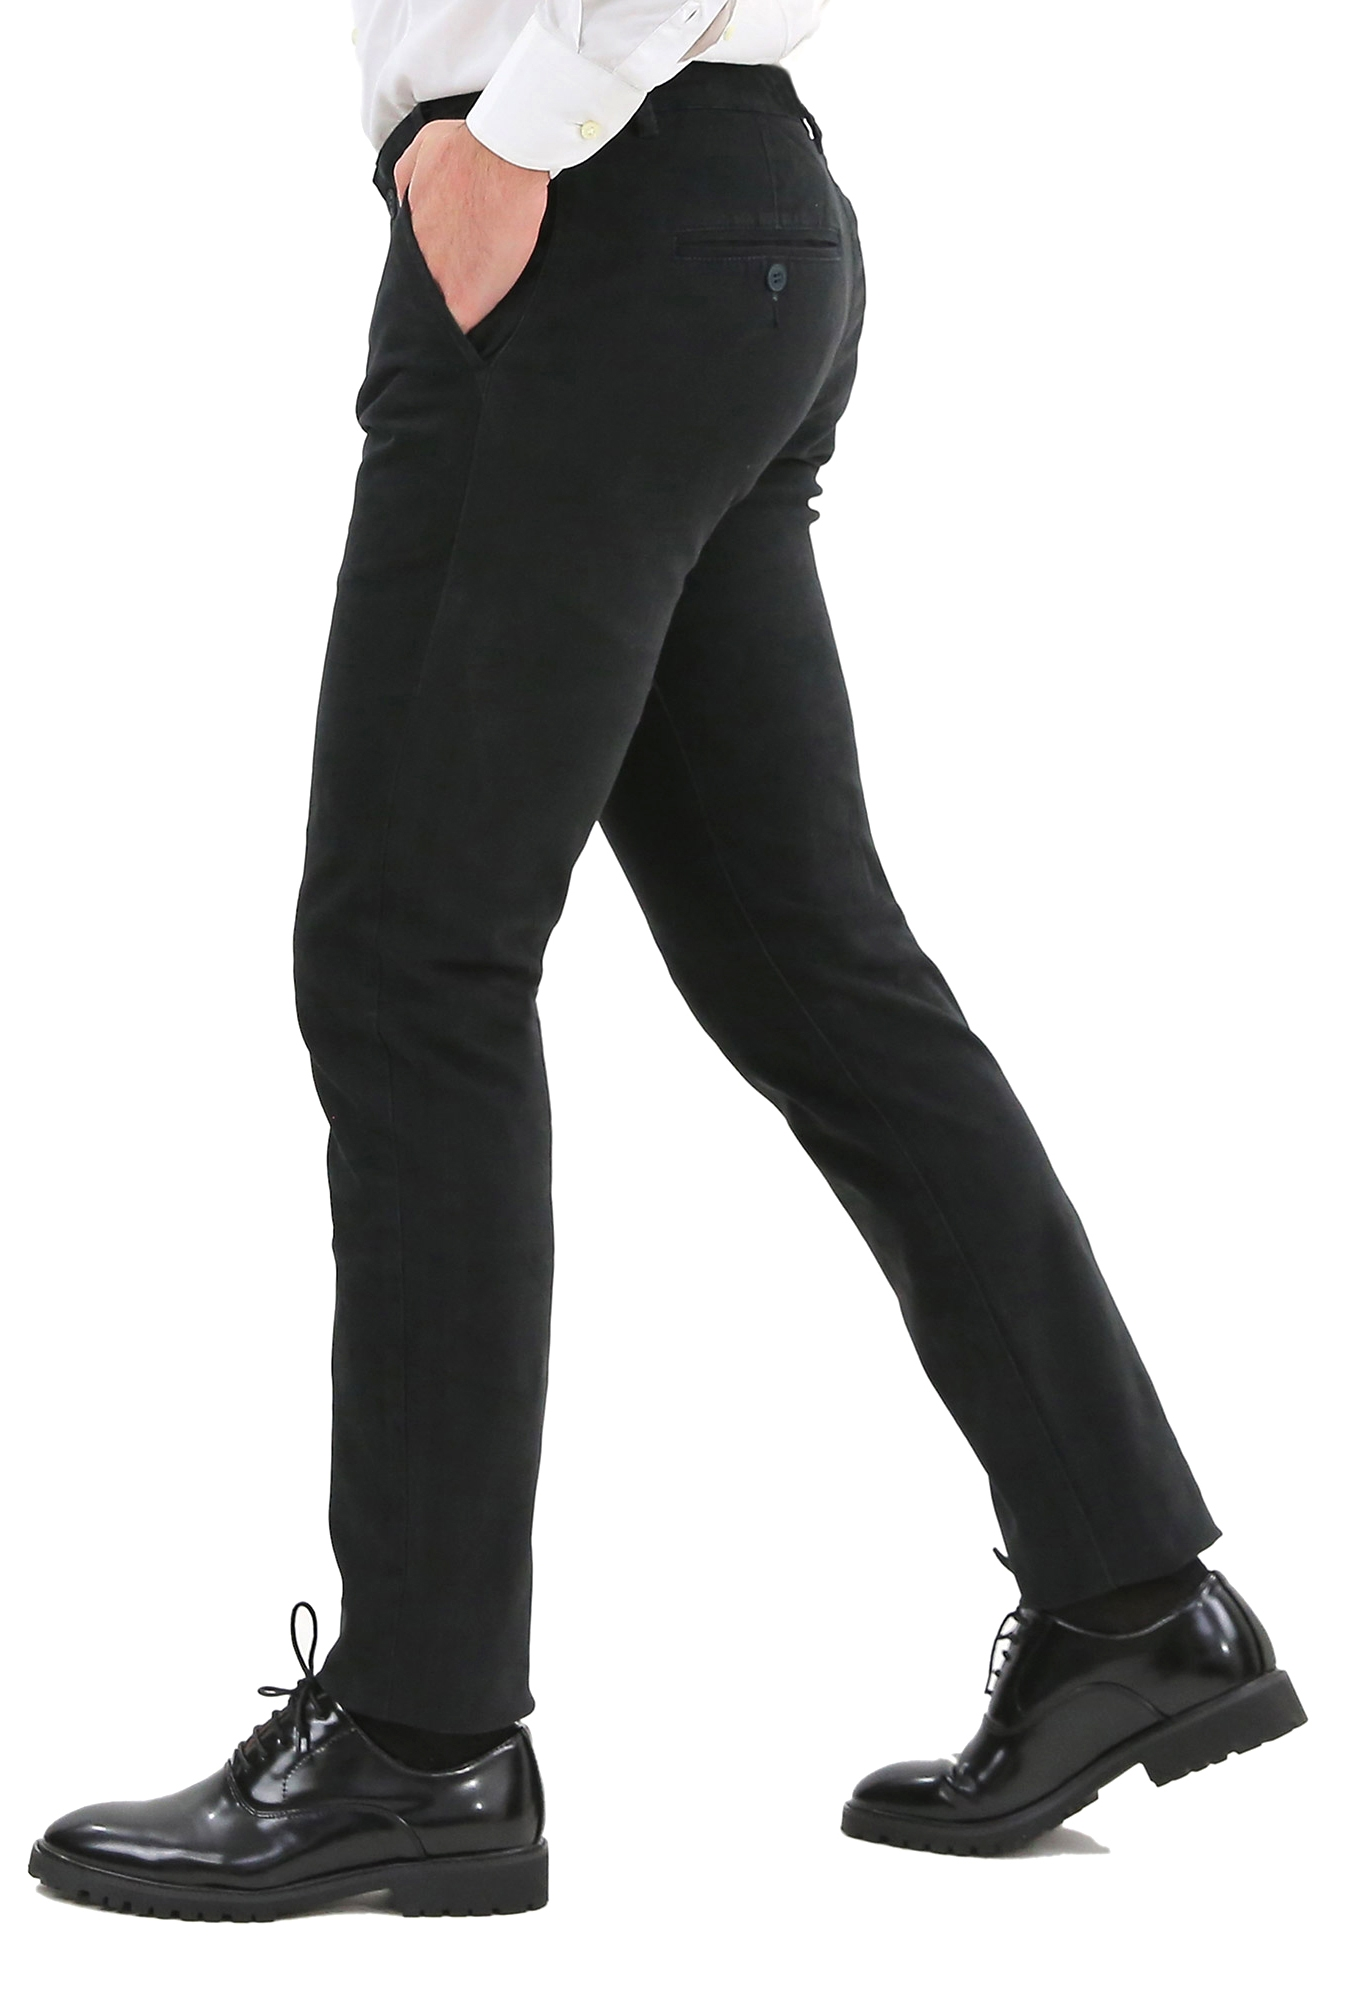 Pantaloni-Uomo-Slim-Fit-Eleganti-Invernali-Blu-Nero-Classico-Chino-Tasca-America miniatura 12